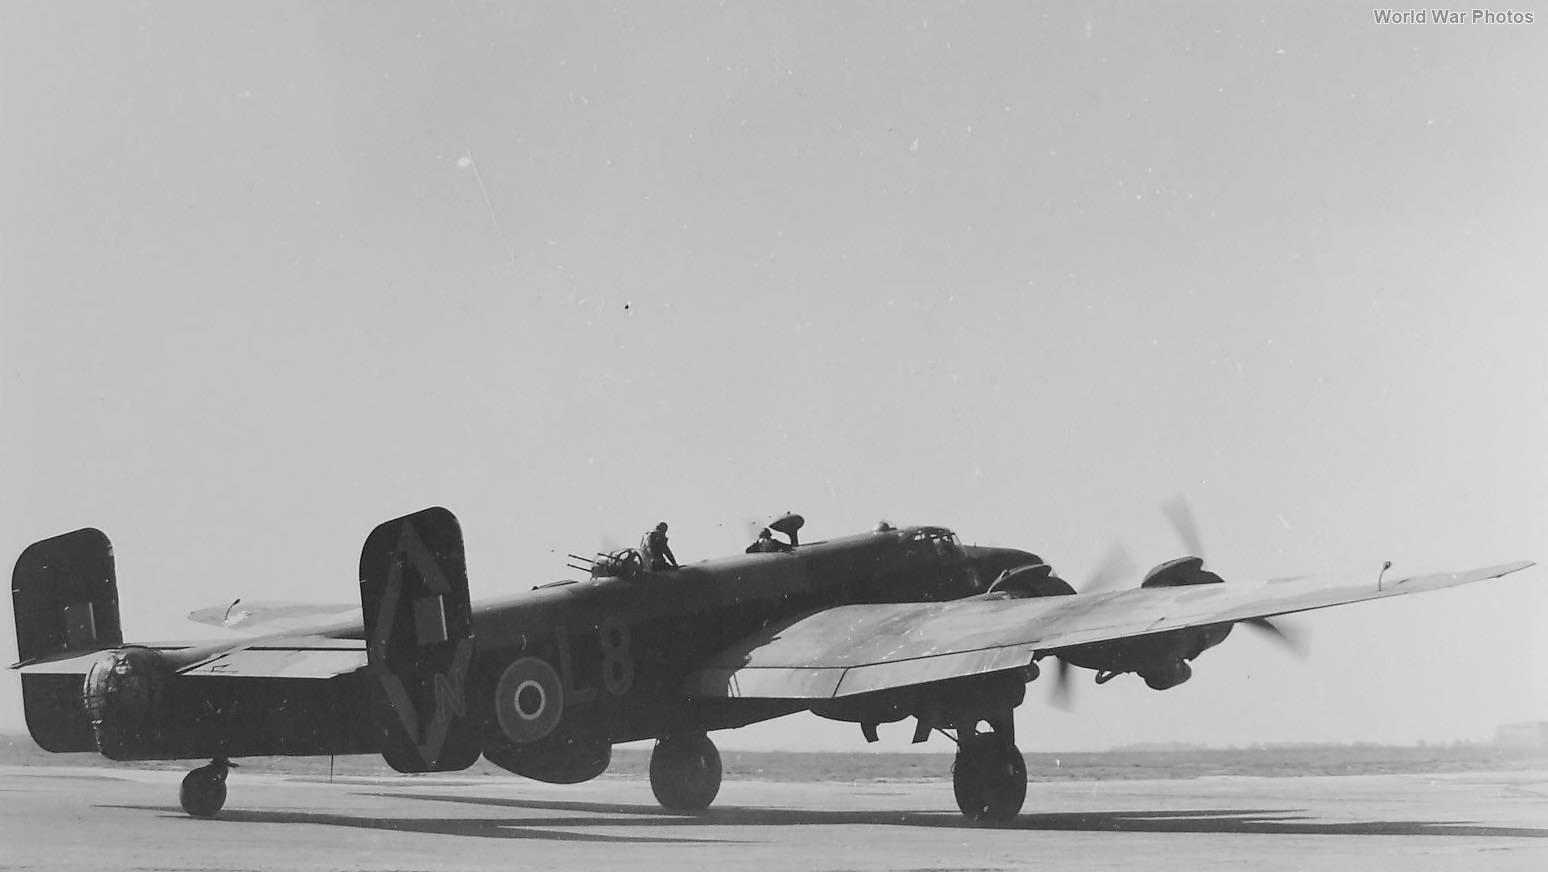 Halifax L8-N 347